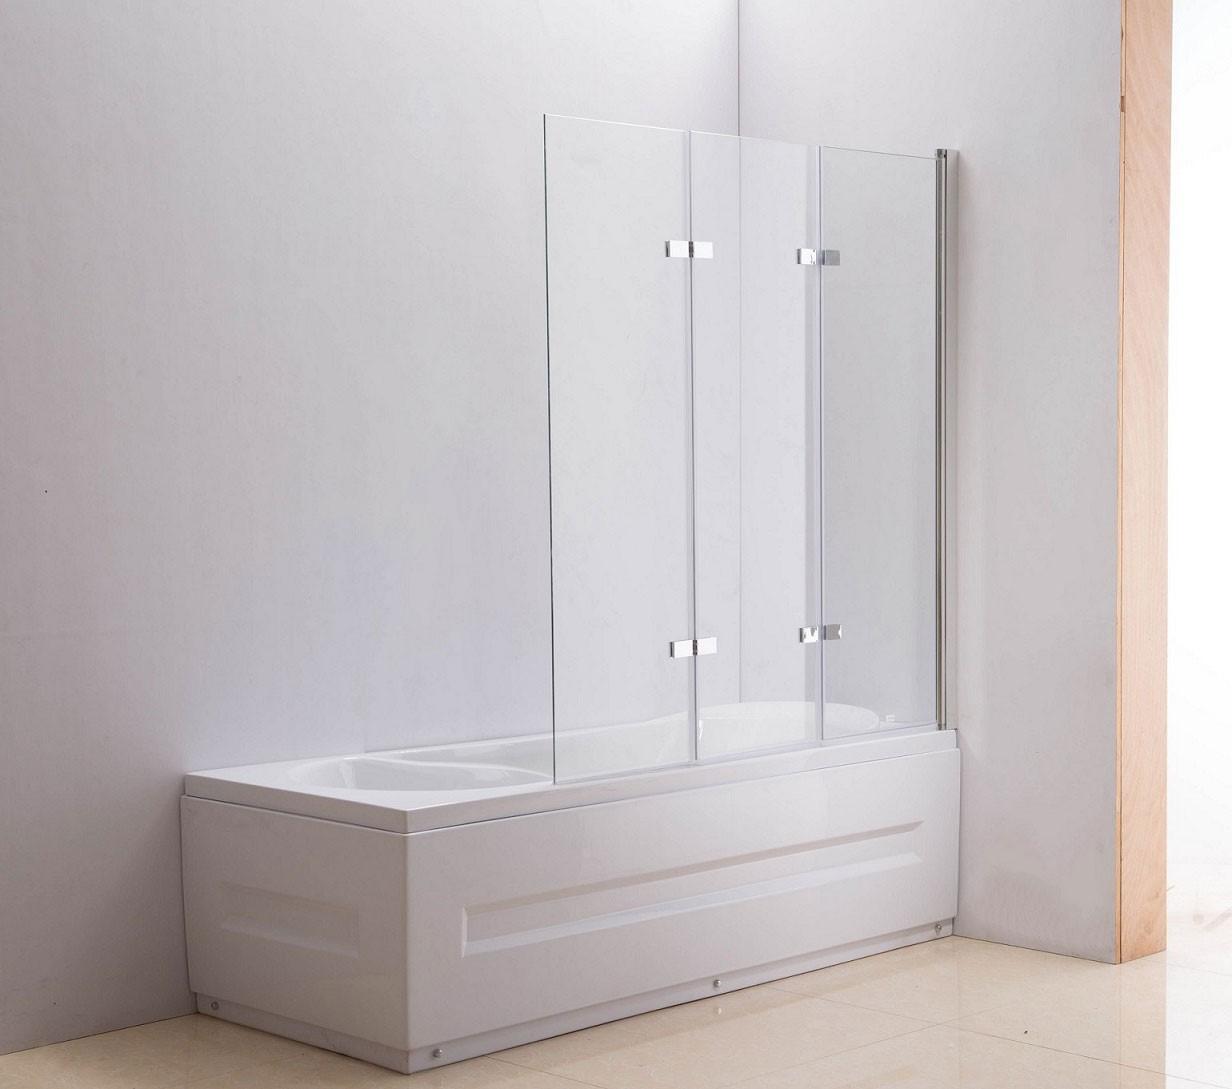 Paroi de douche Nano pour baignoire 3 portes